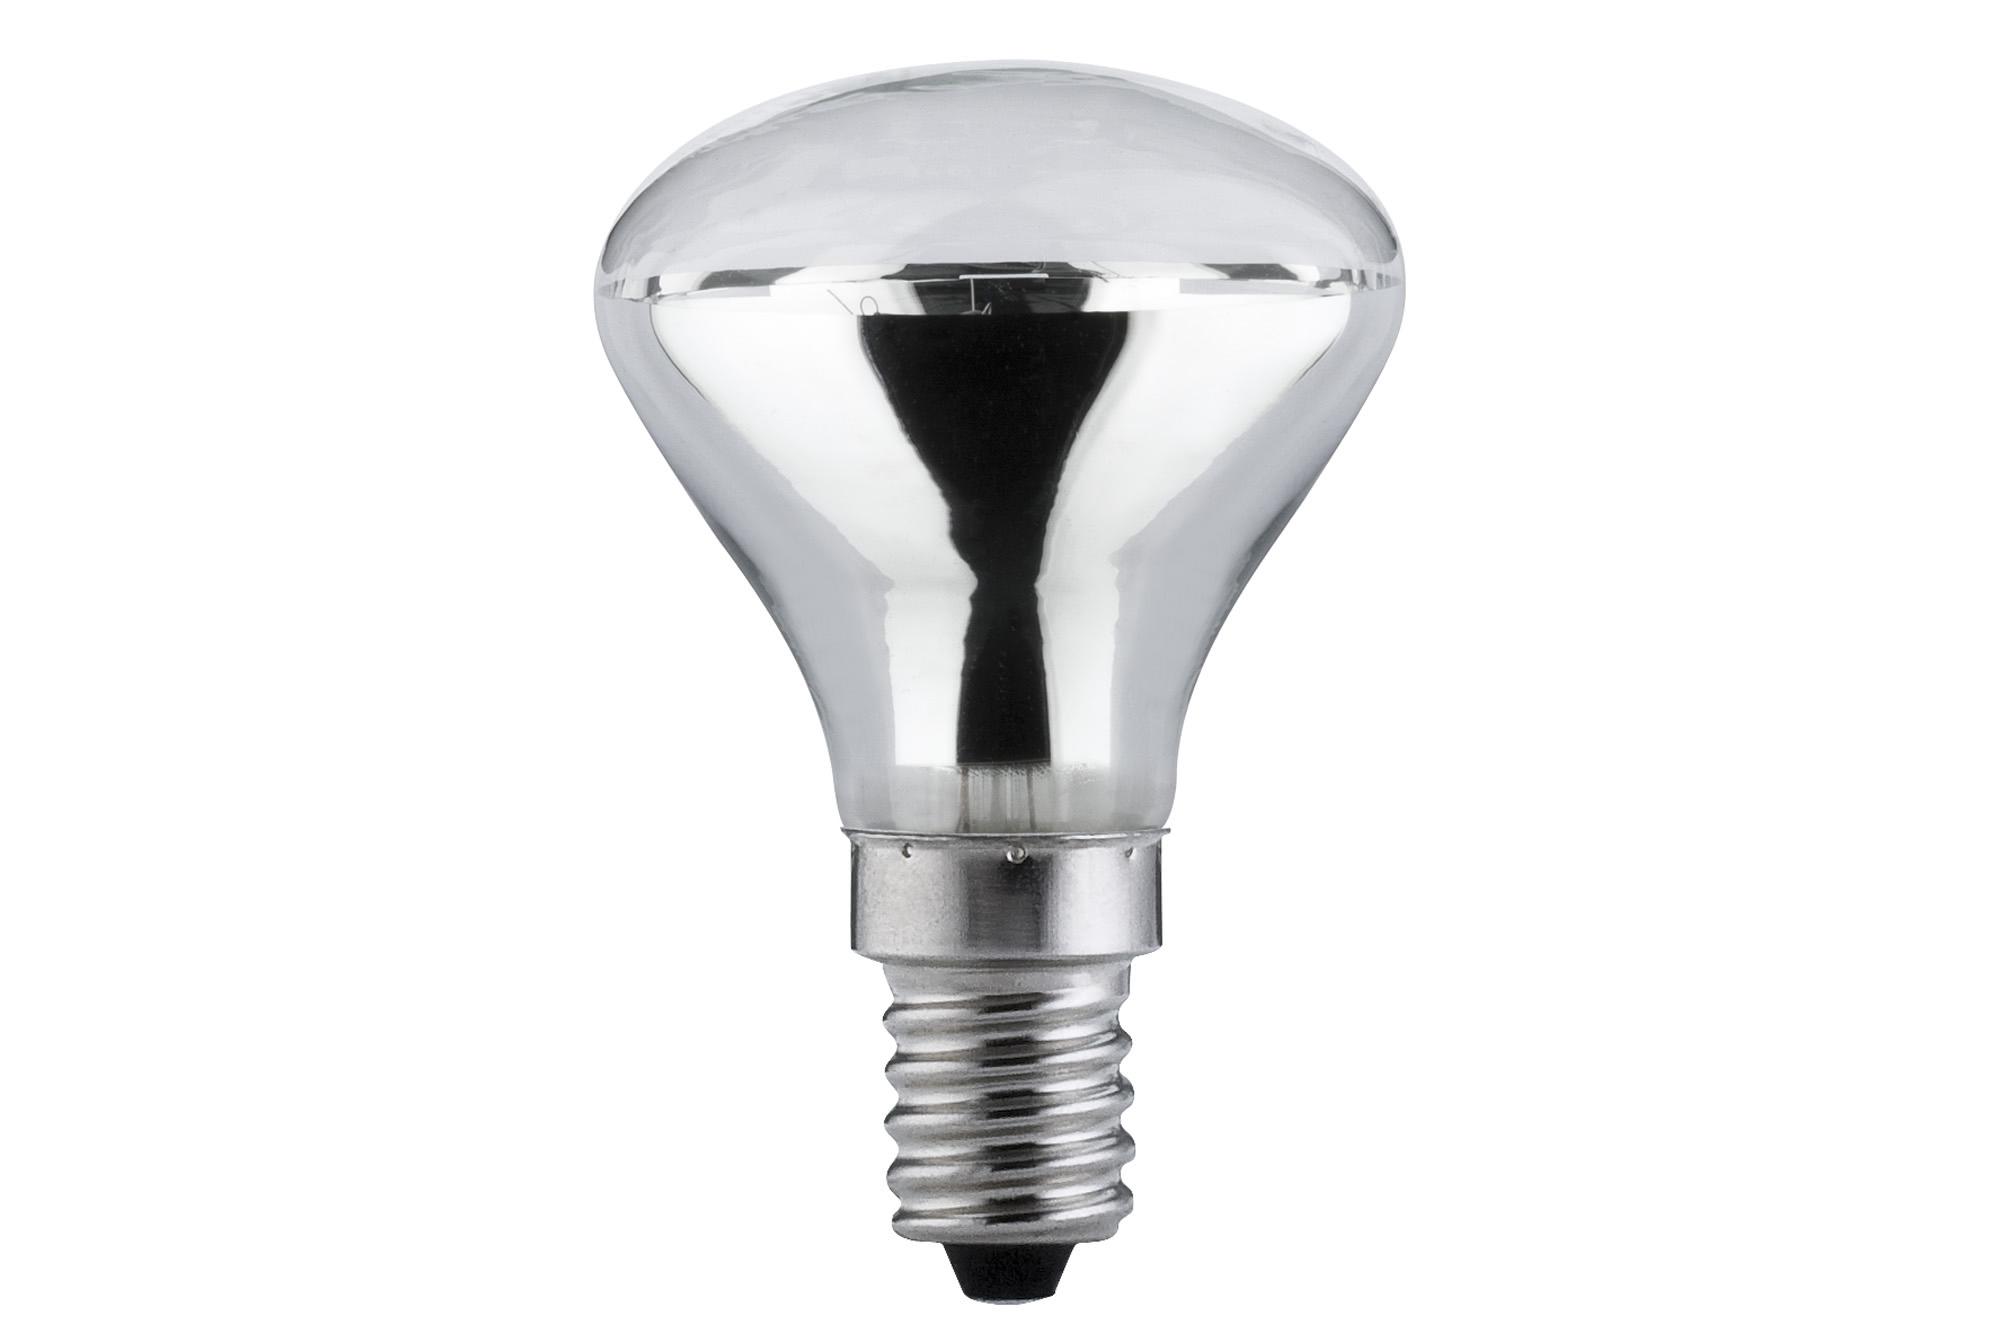 Paulmann. 20047 Лампа Reflektor R45 50W E14 f?r Lavaleuchten